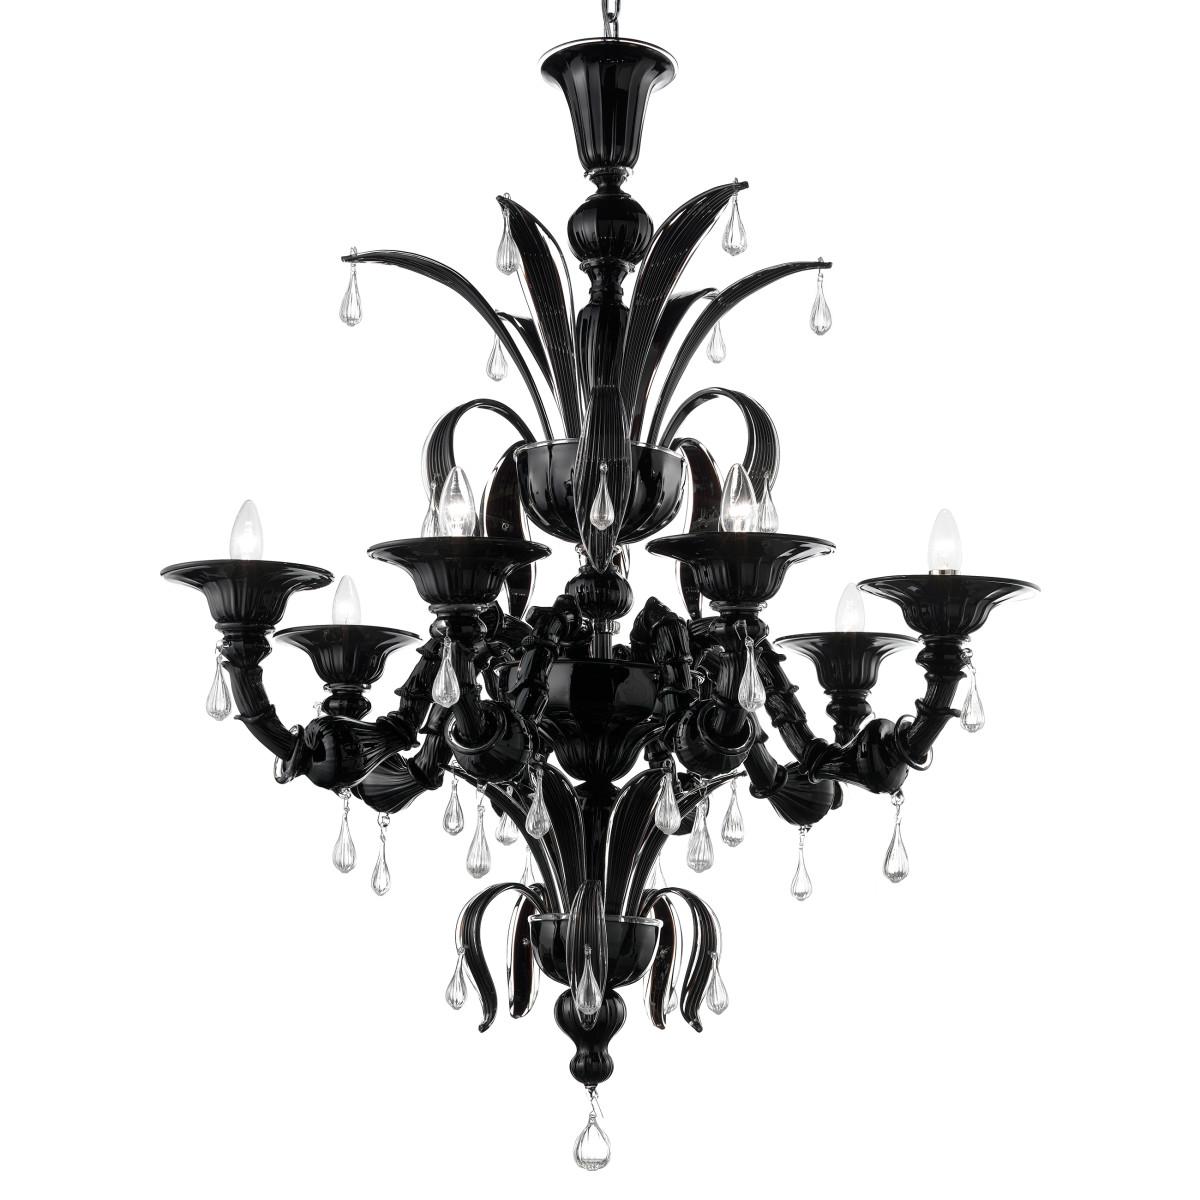 Paradiso 8 flammig Murano Kronleuchter - schwarze transparent farbe